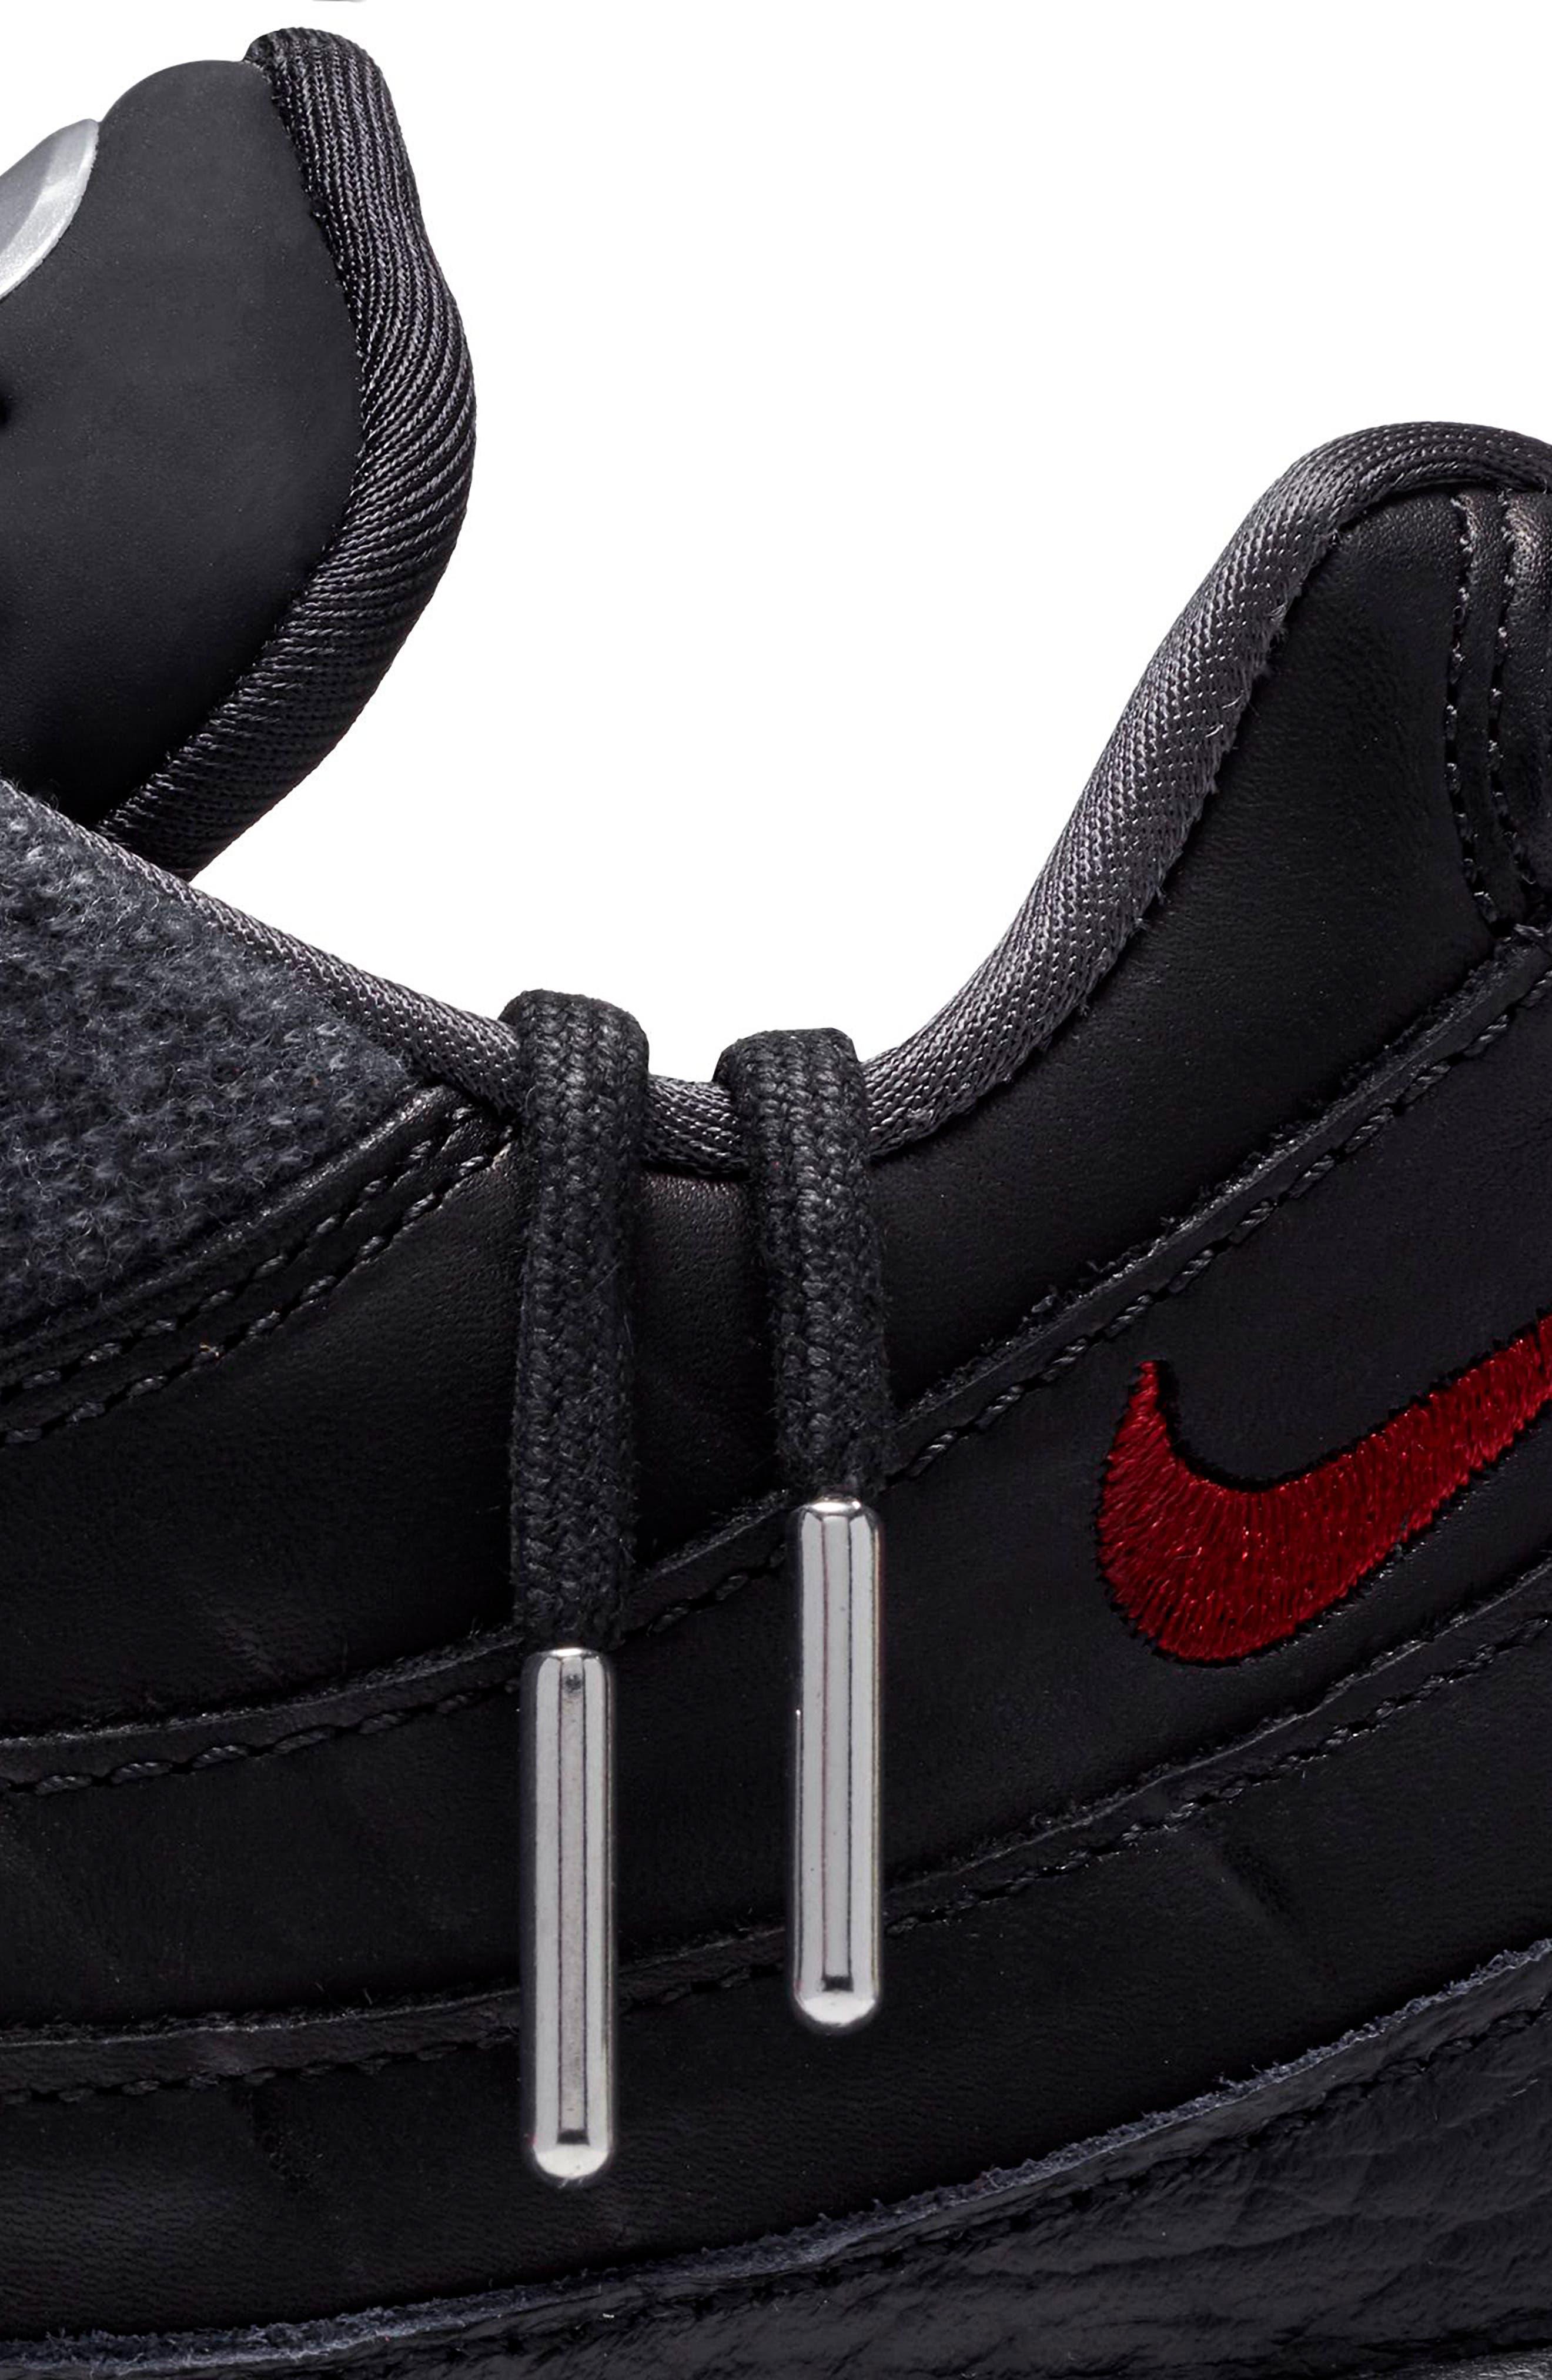 Air Max 95 NRG Sneaker,                             Alternate thumbnail 8, color,                             BLACK/ TEAM RED/ ANTHRACITE